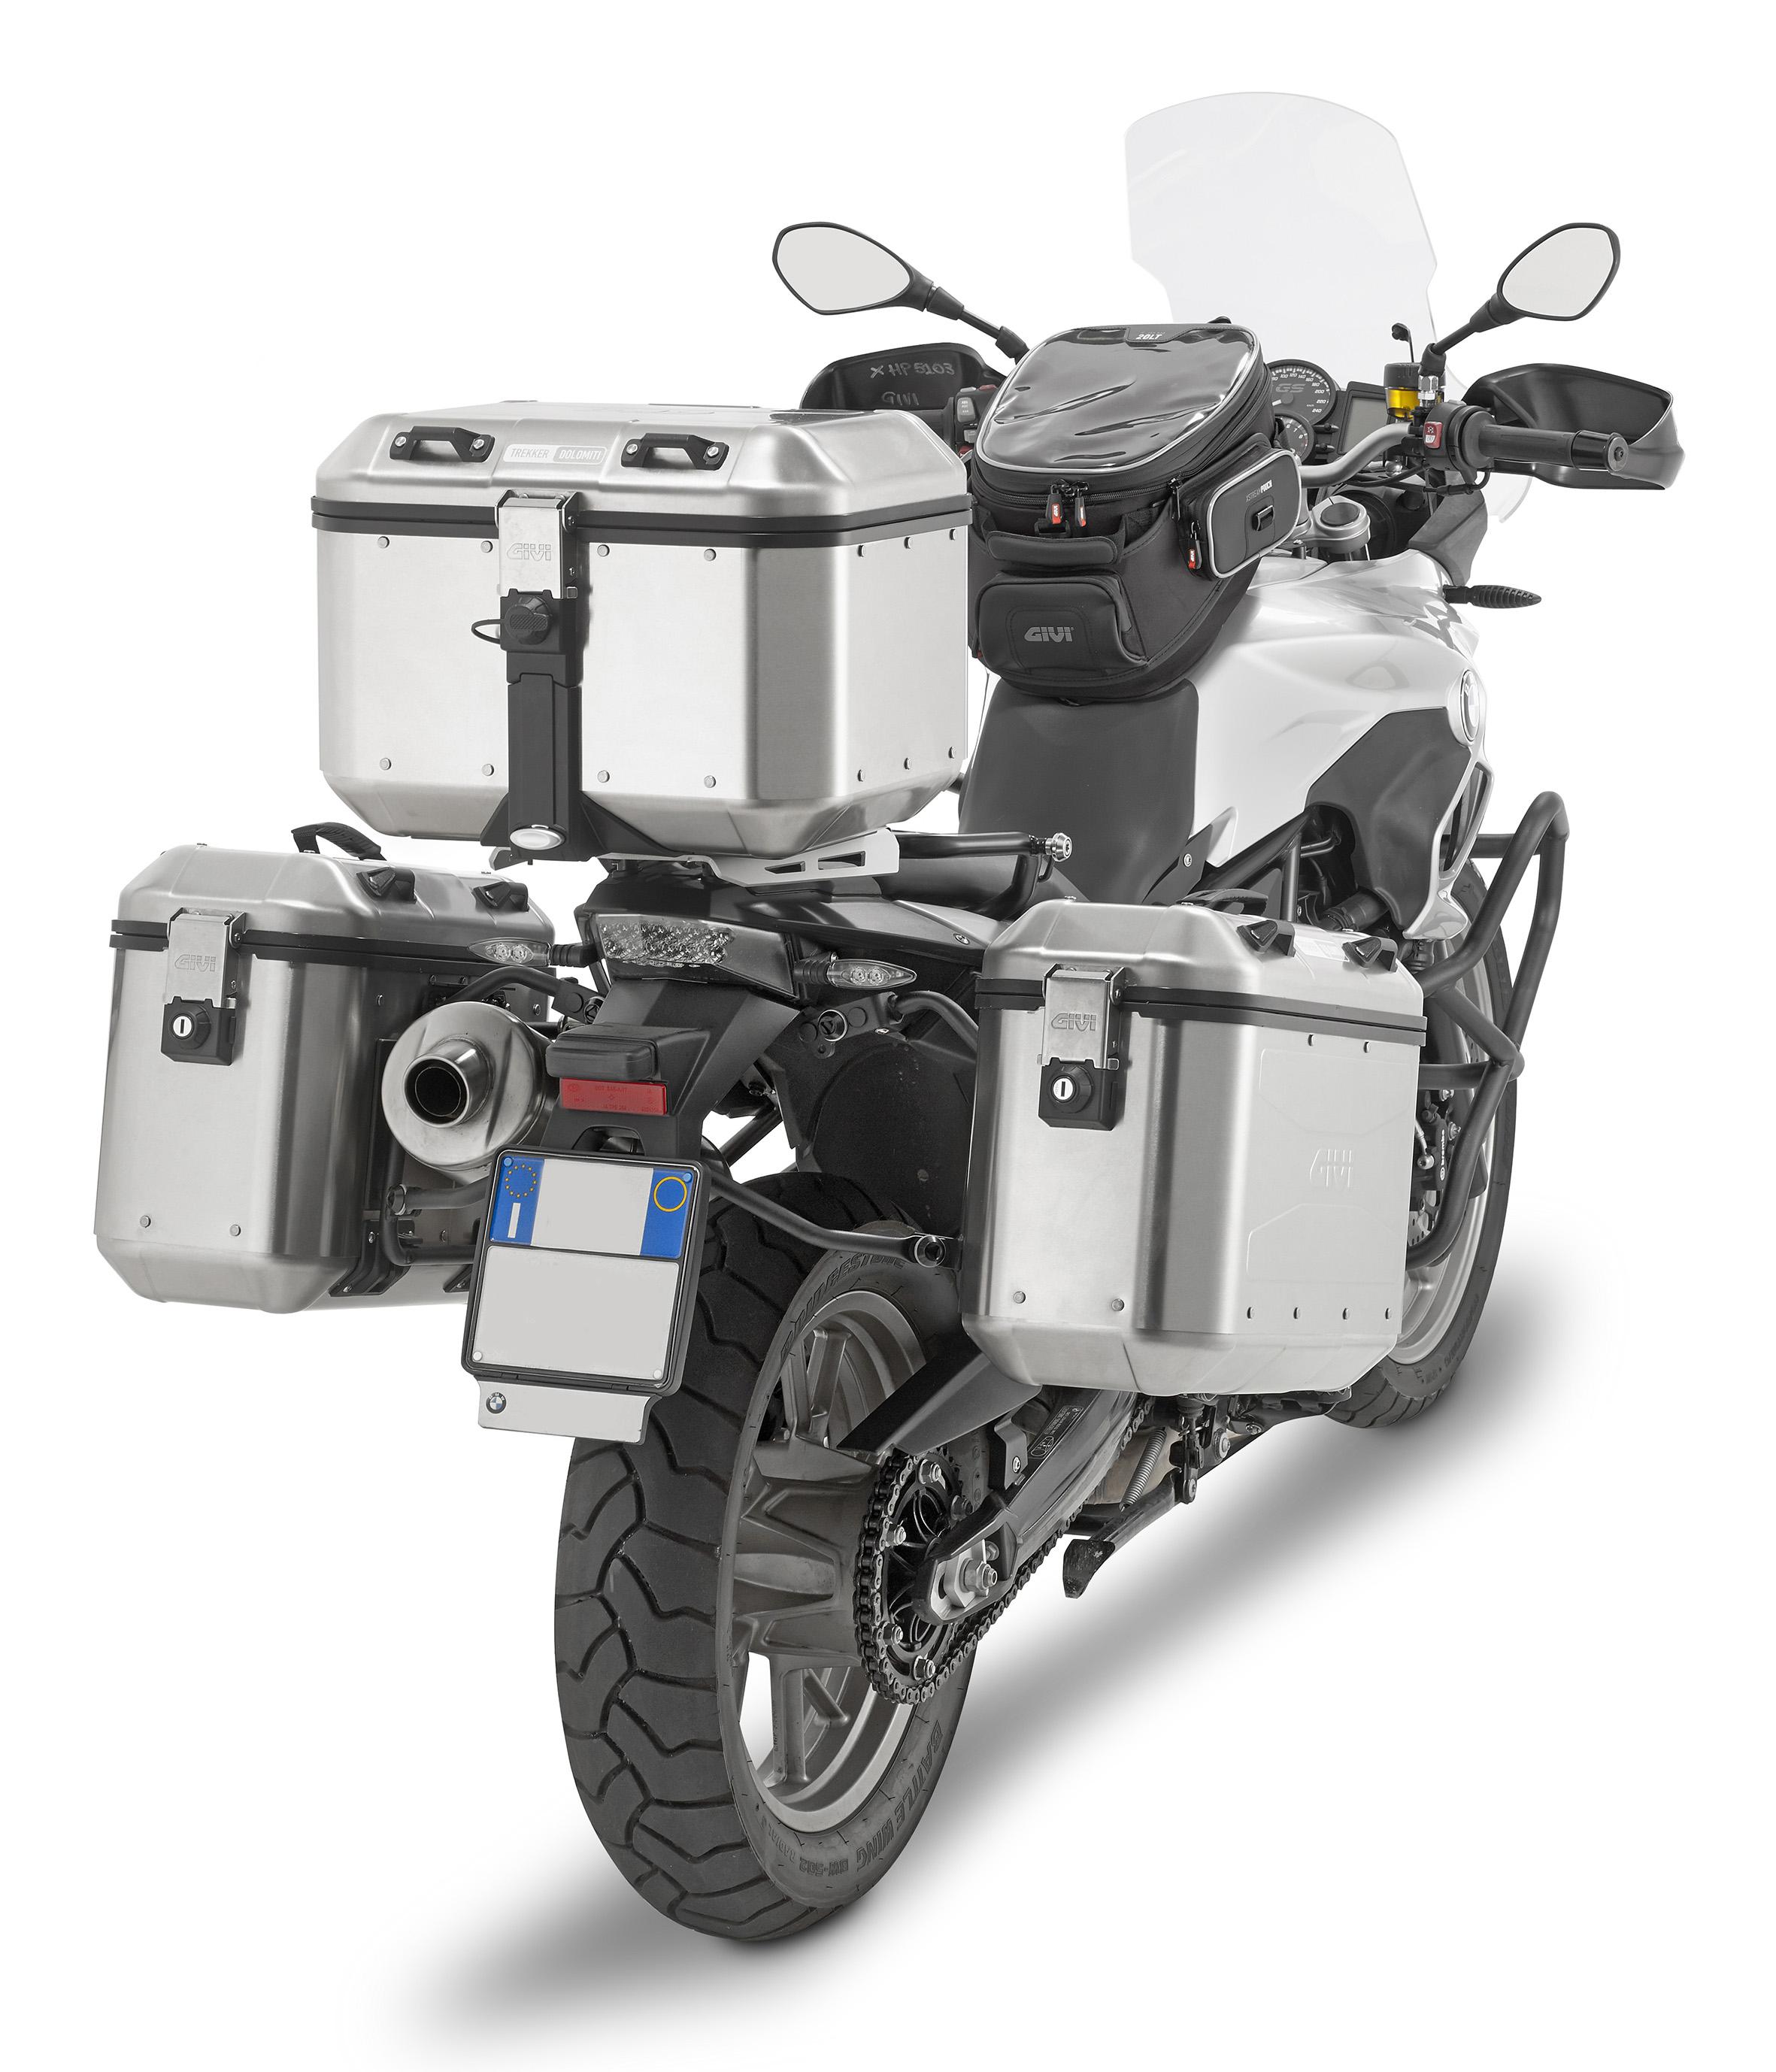 cf61b3f0c04 GIVI DLM46 Trekker Dolomiti topkoffer aluminium | RAD.EU